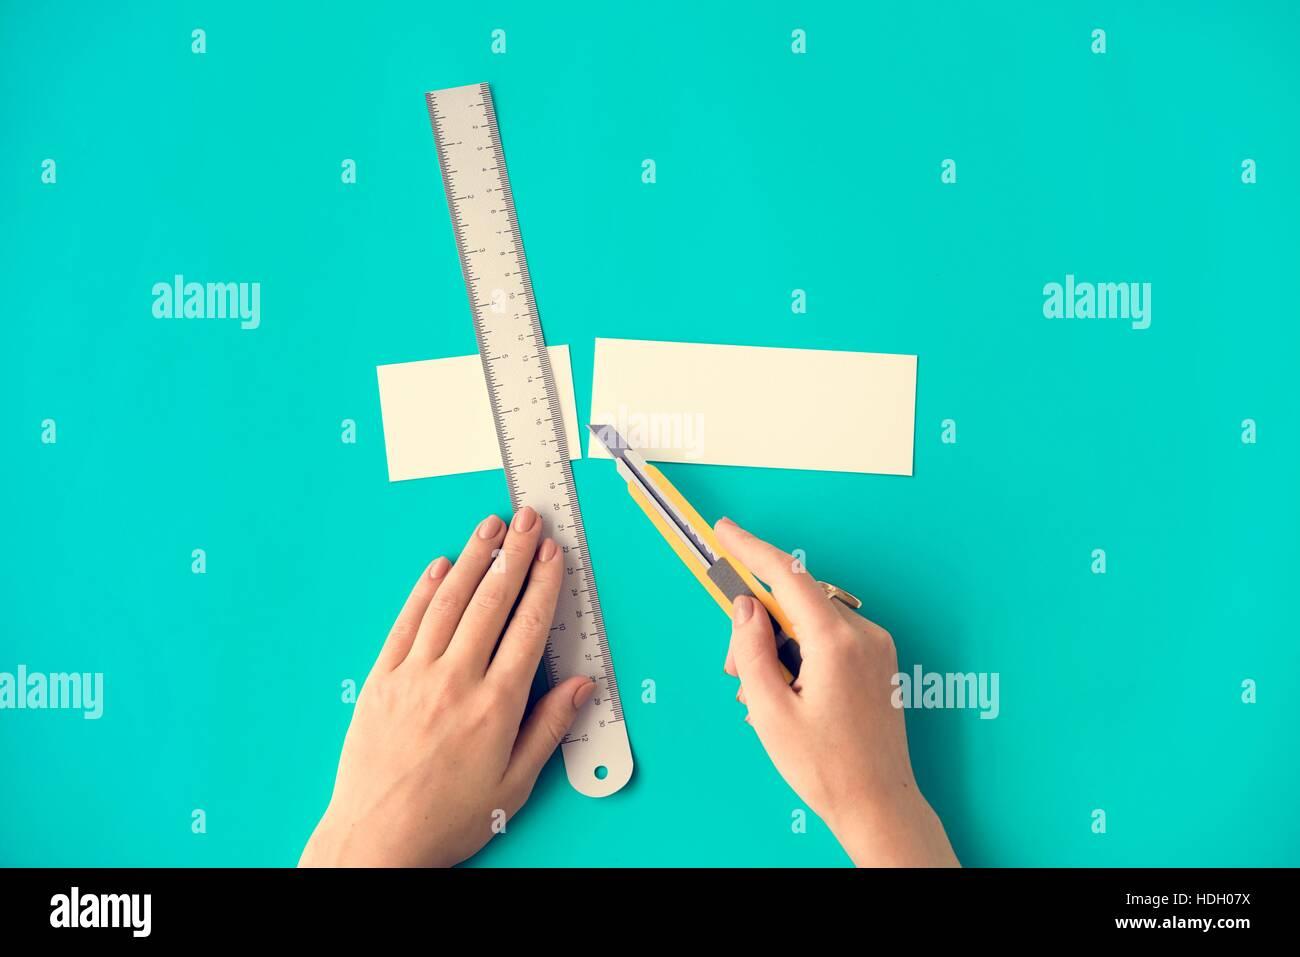 Cutter Ruler Paper Art Color Design Creative Concept - Stock Image